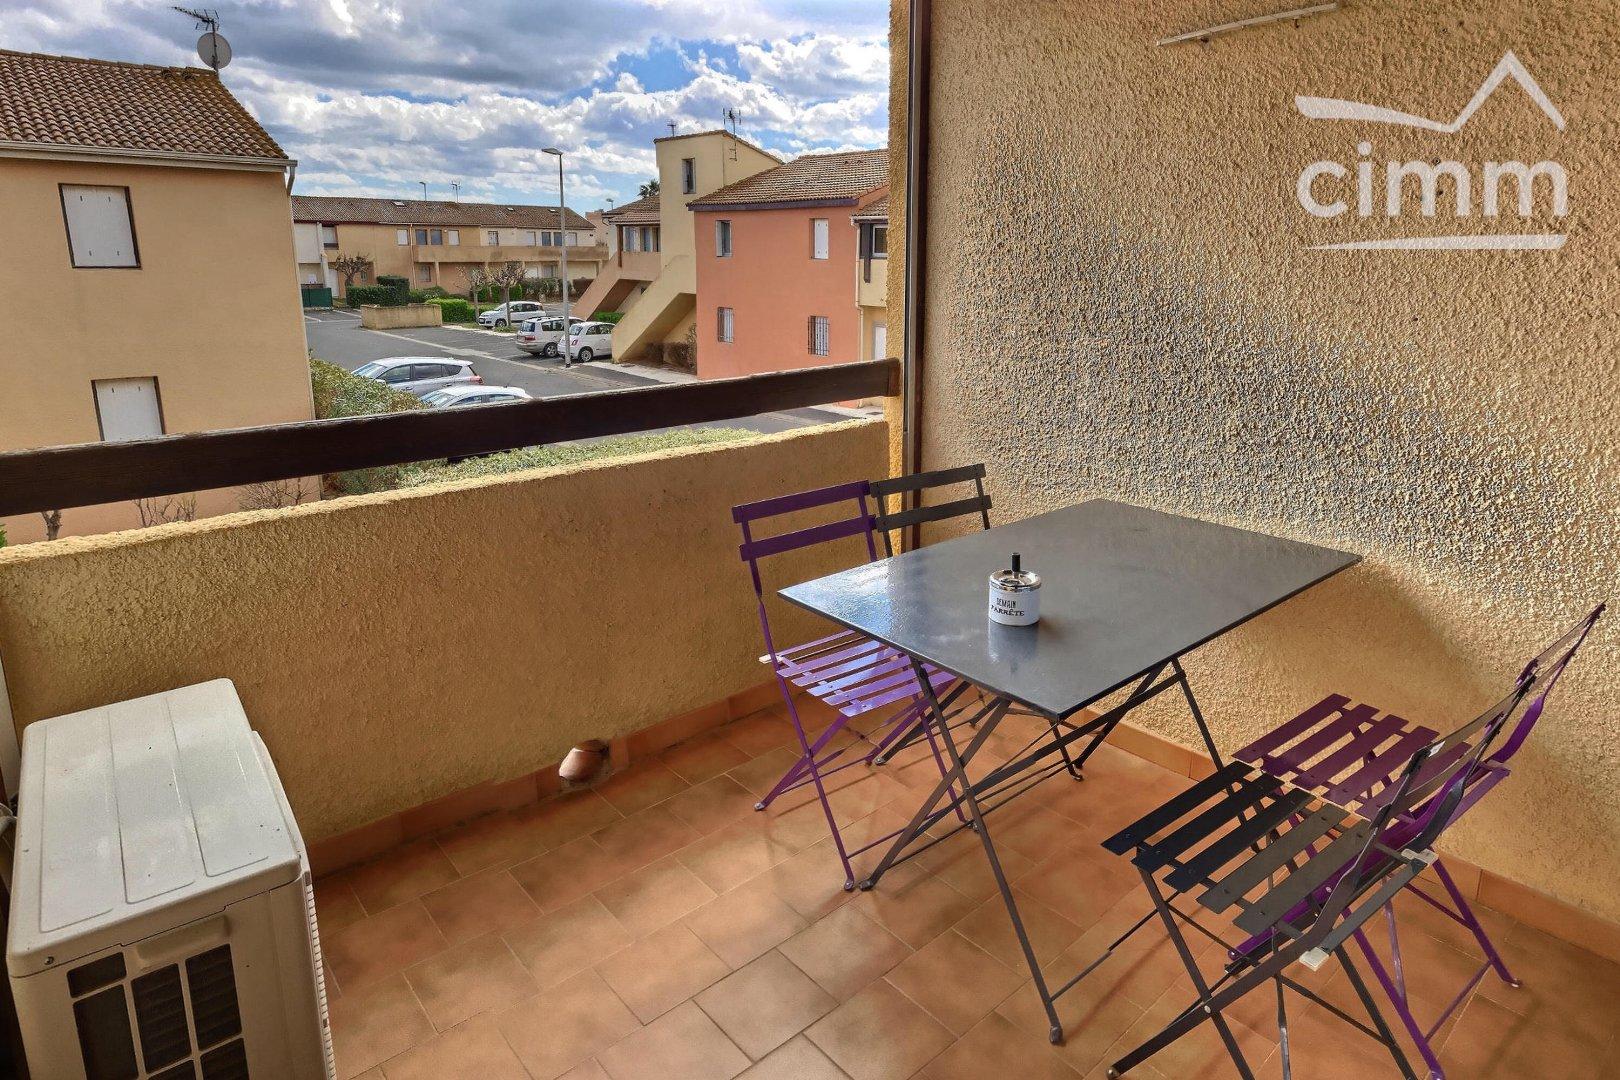 Image - Appartement - VALRAS PLAGE - Location Vacances - 35m² - IMMOPLAGE VALRAS-PLAGE